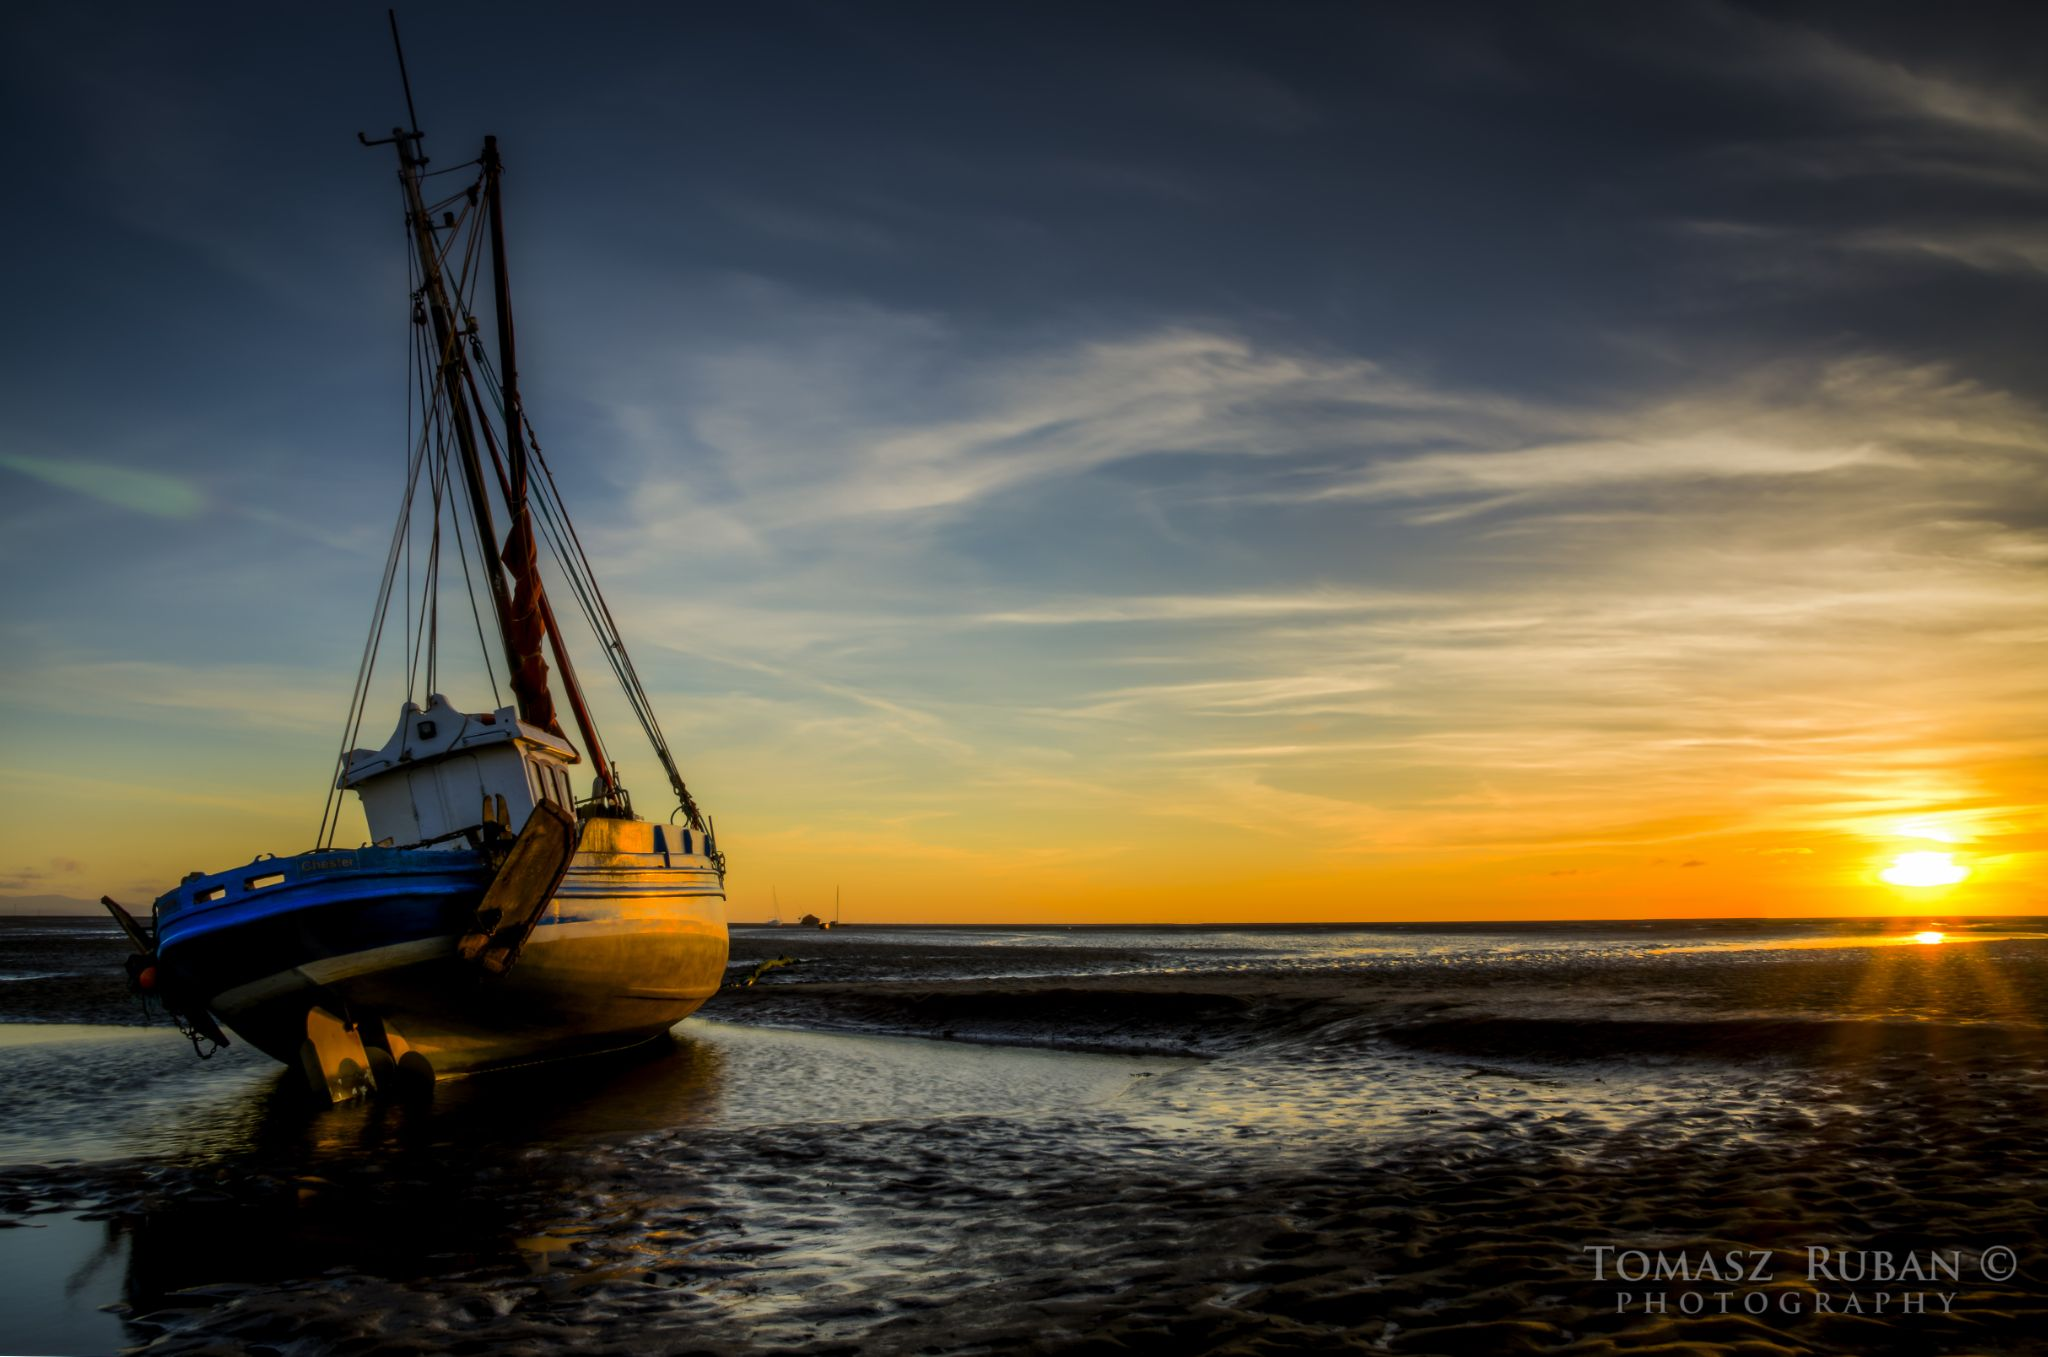 Melos beach by Tomasz Ruban Photography